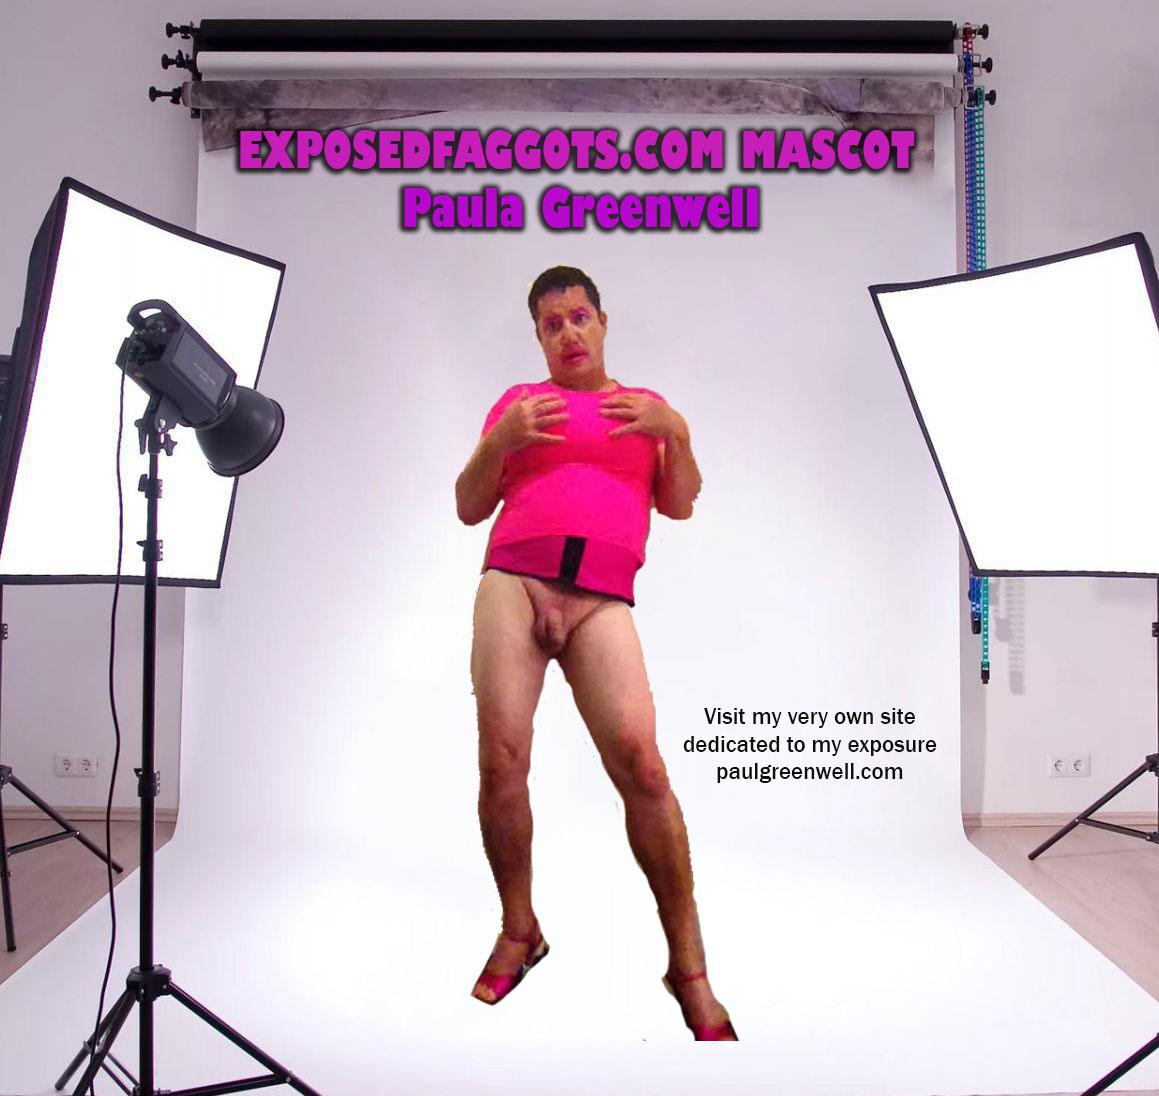 EXPOSEDFAGGOTS.COM MASCOT PAUL GREENWELL